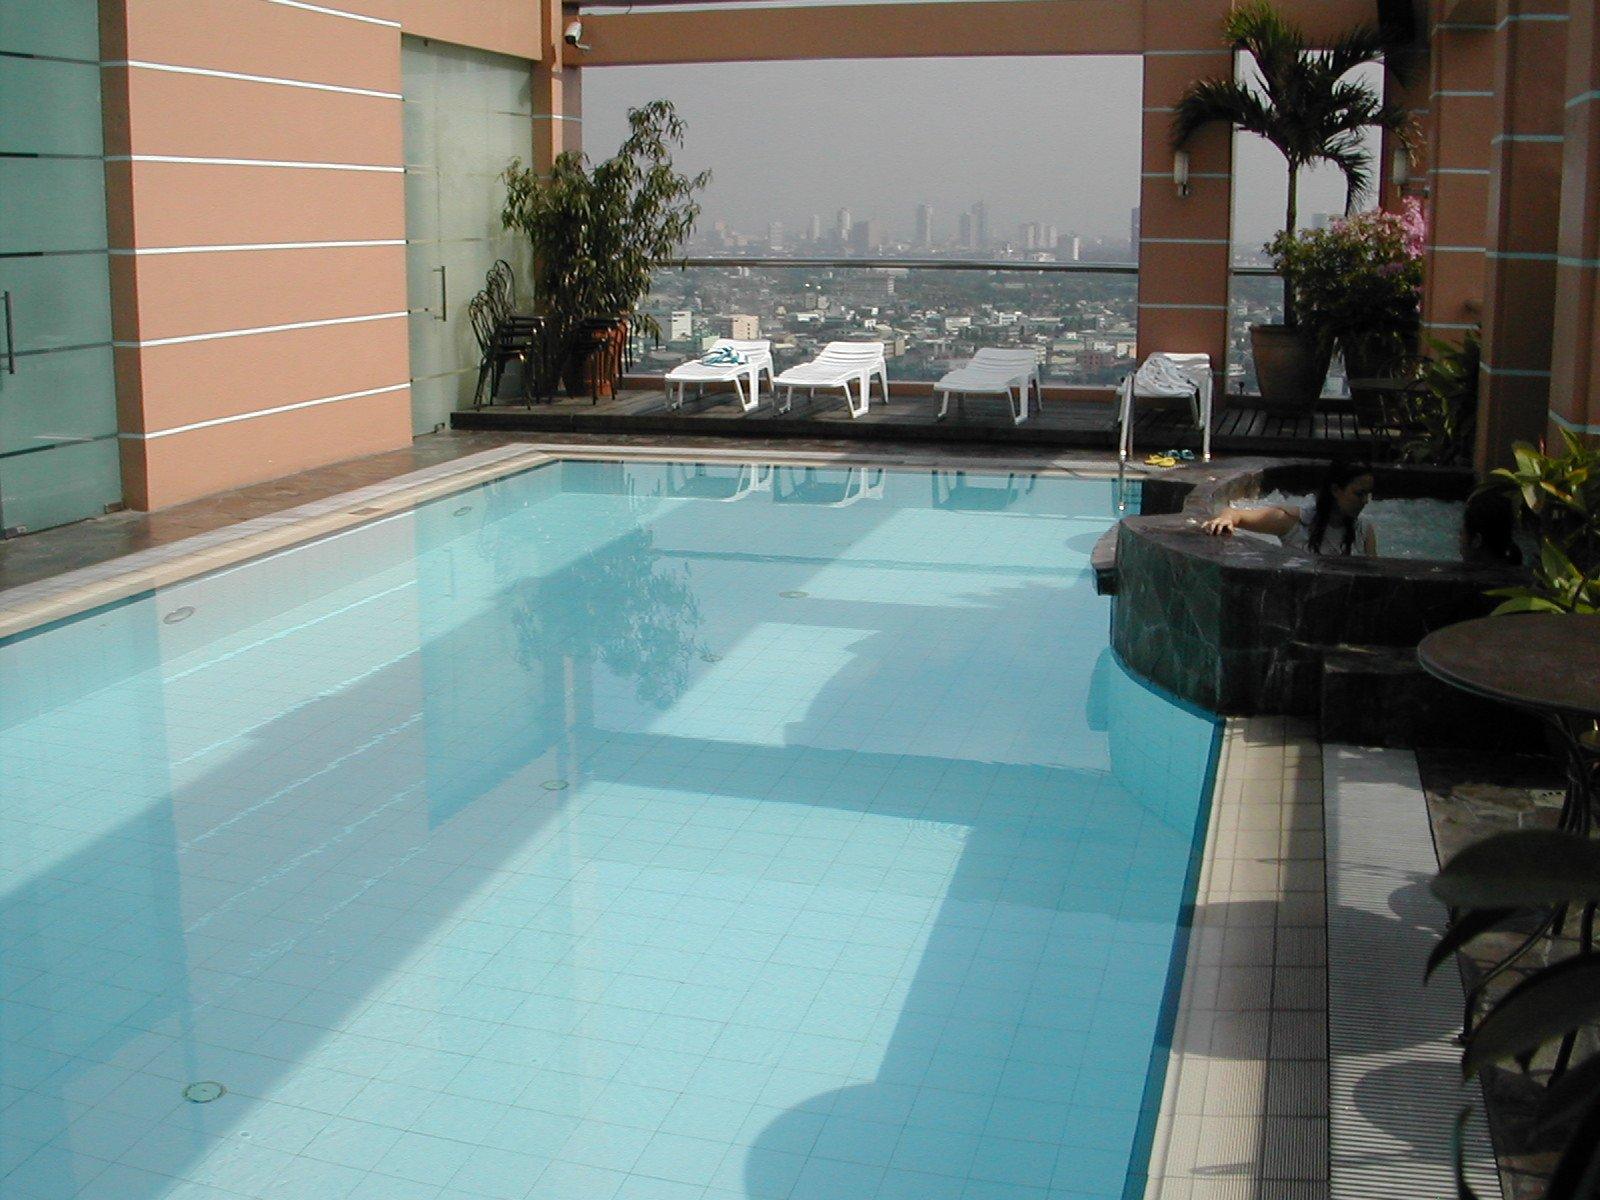 004_City-Garden-Hotel